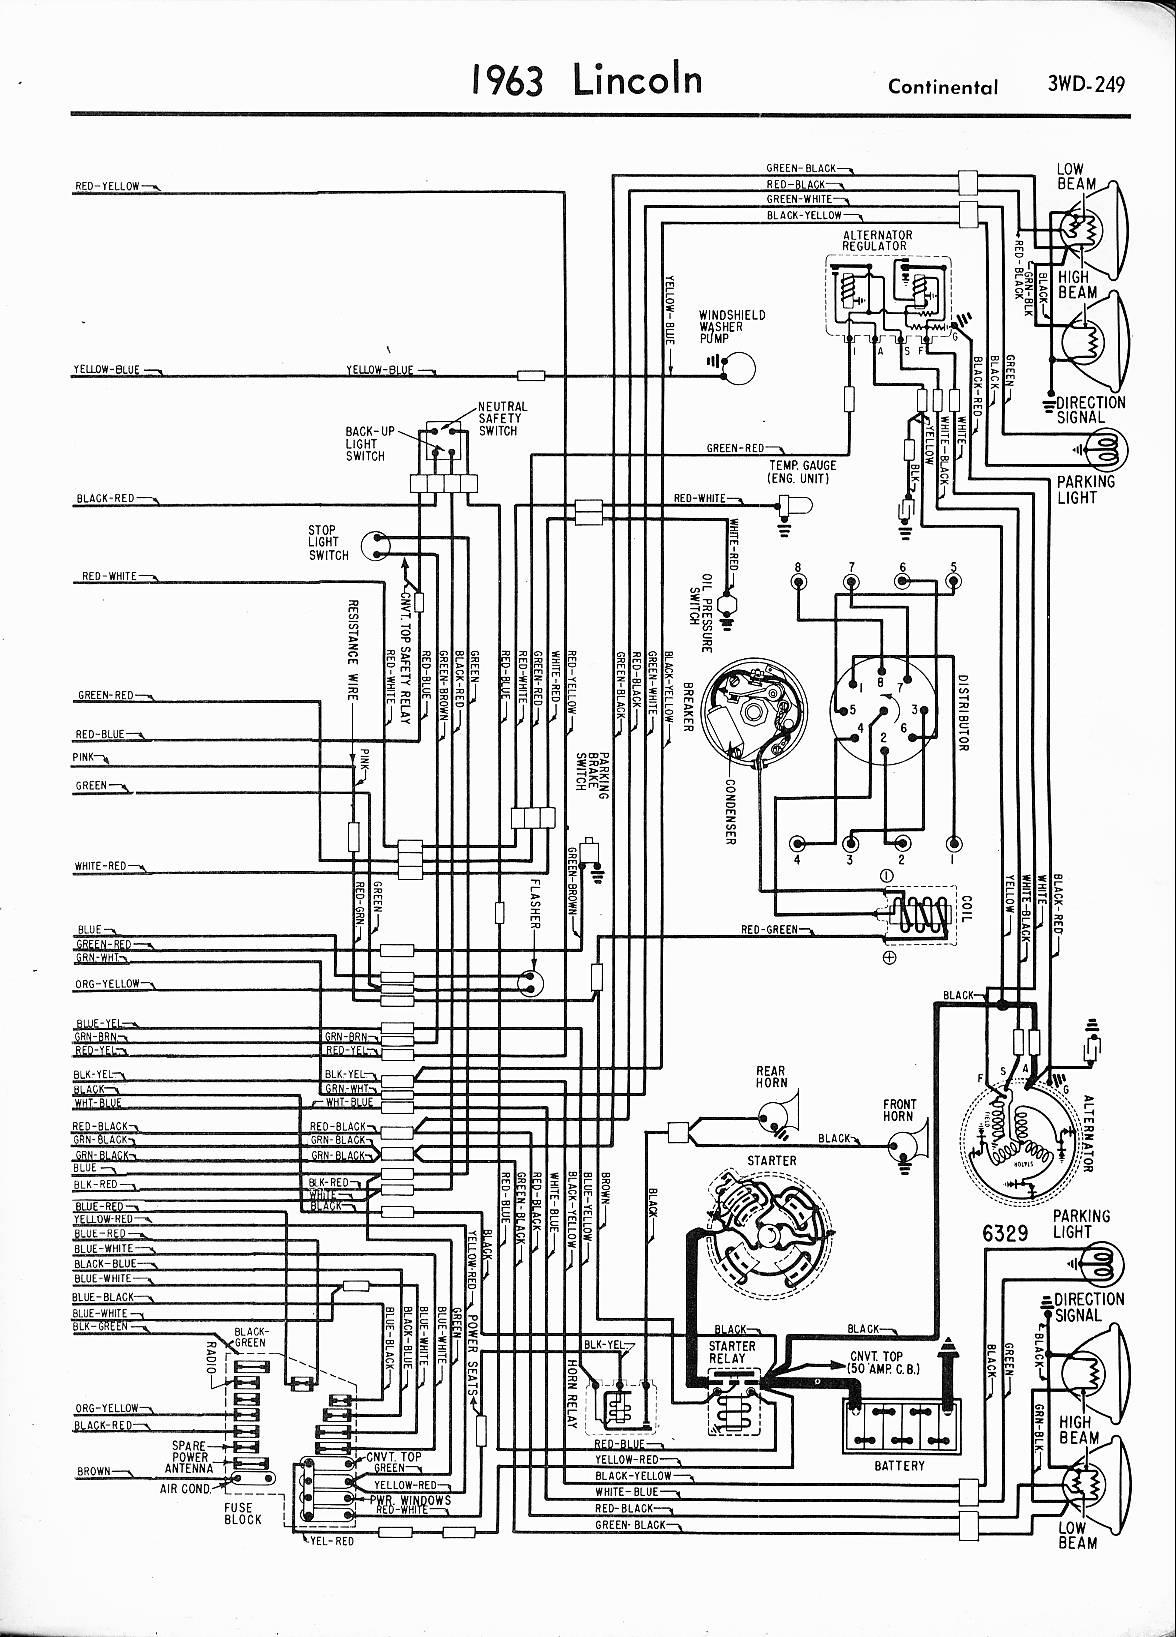 Remarkable 67 Lincoln Continental Wiring Diagram Basic Electronics Wiring Diagram Wiring Cloud Licukosporaidewilluminateatxorg